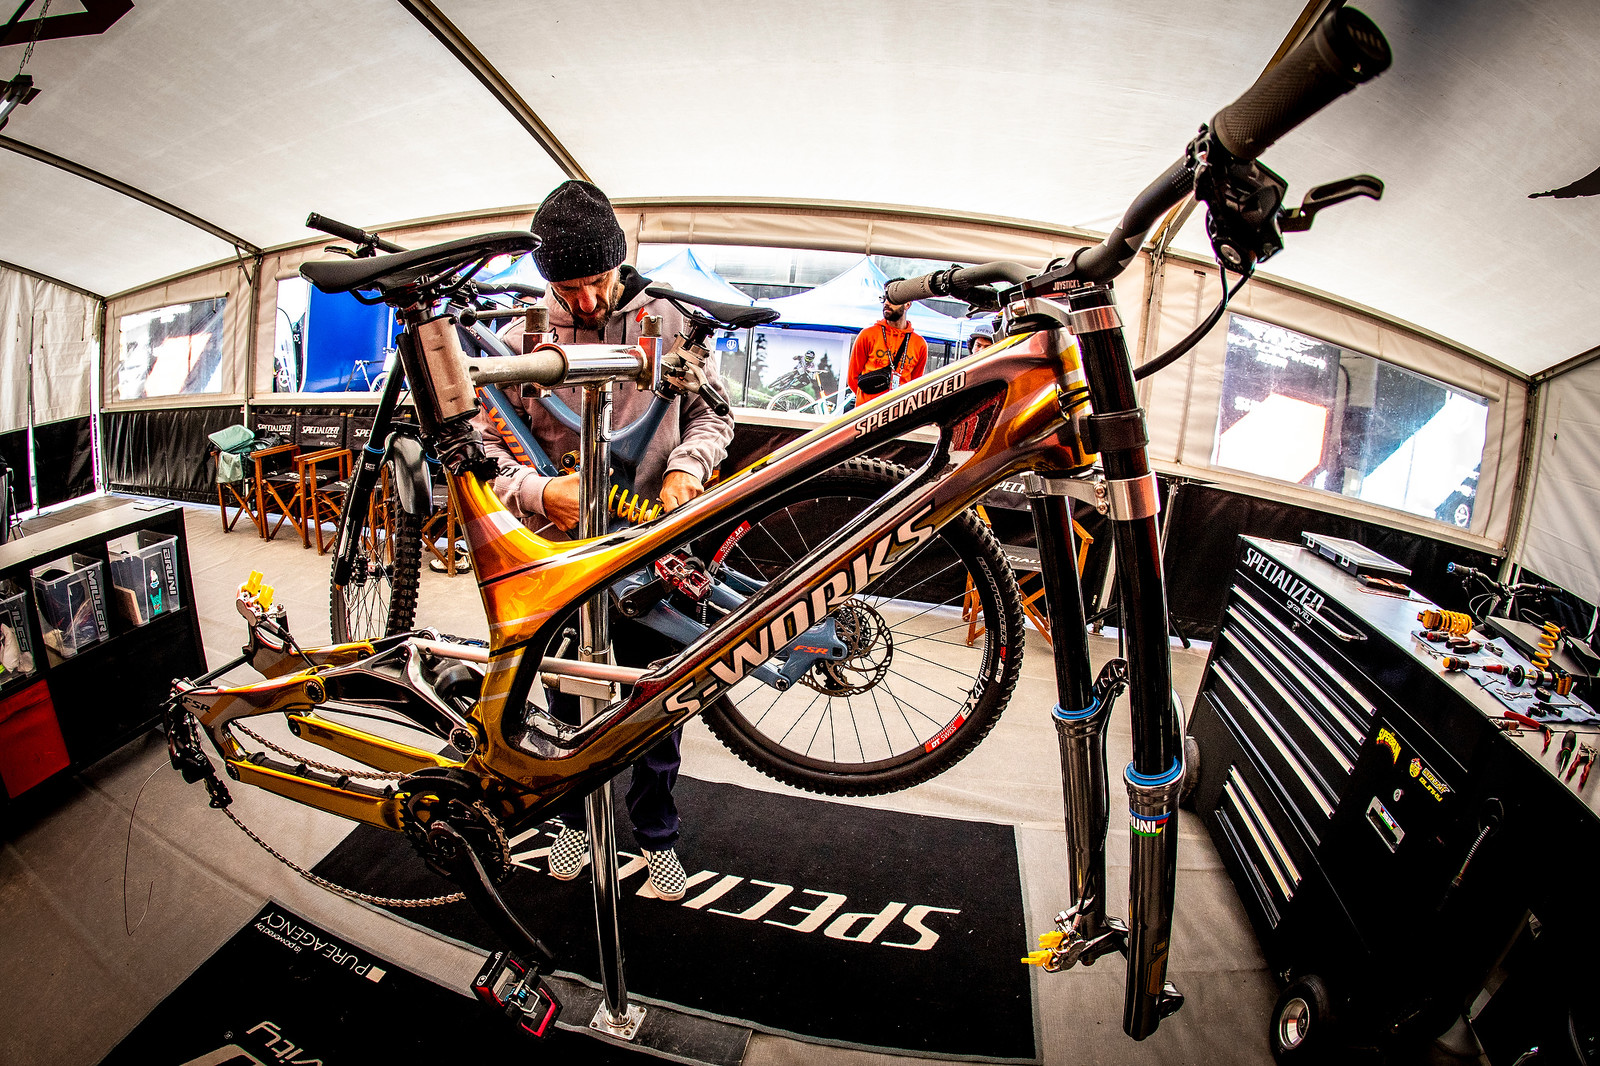 Assembling the Bling Bike - WORLD CHAMPS BIKE - Loic Bruni's Specialized Demo - Mountain Biking Pictures - Vital MTB